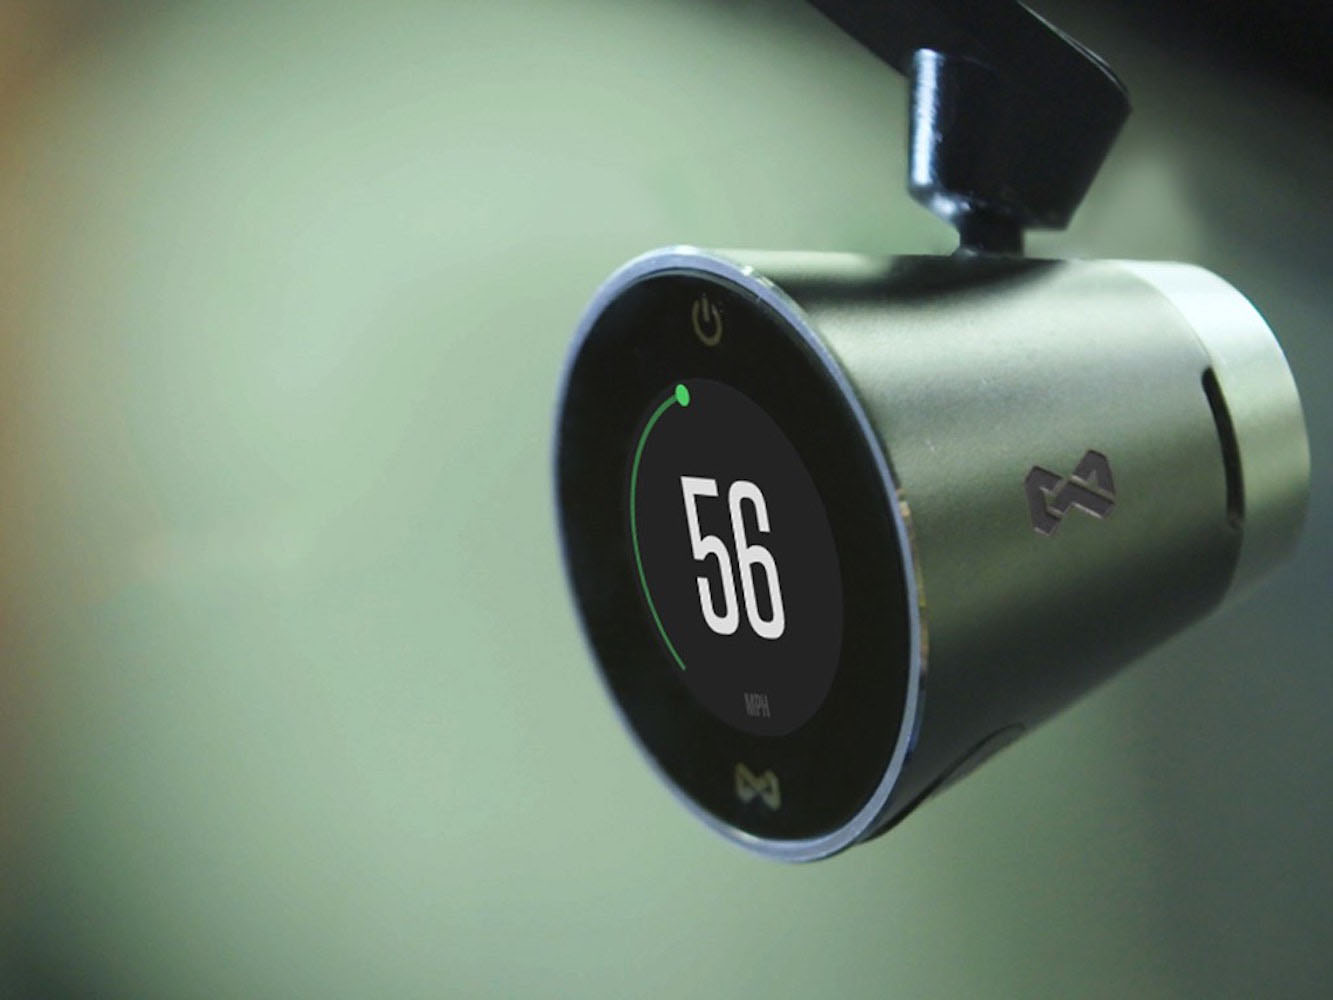 Waylens – A Data Driven Automotive Camera System